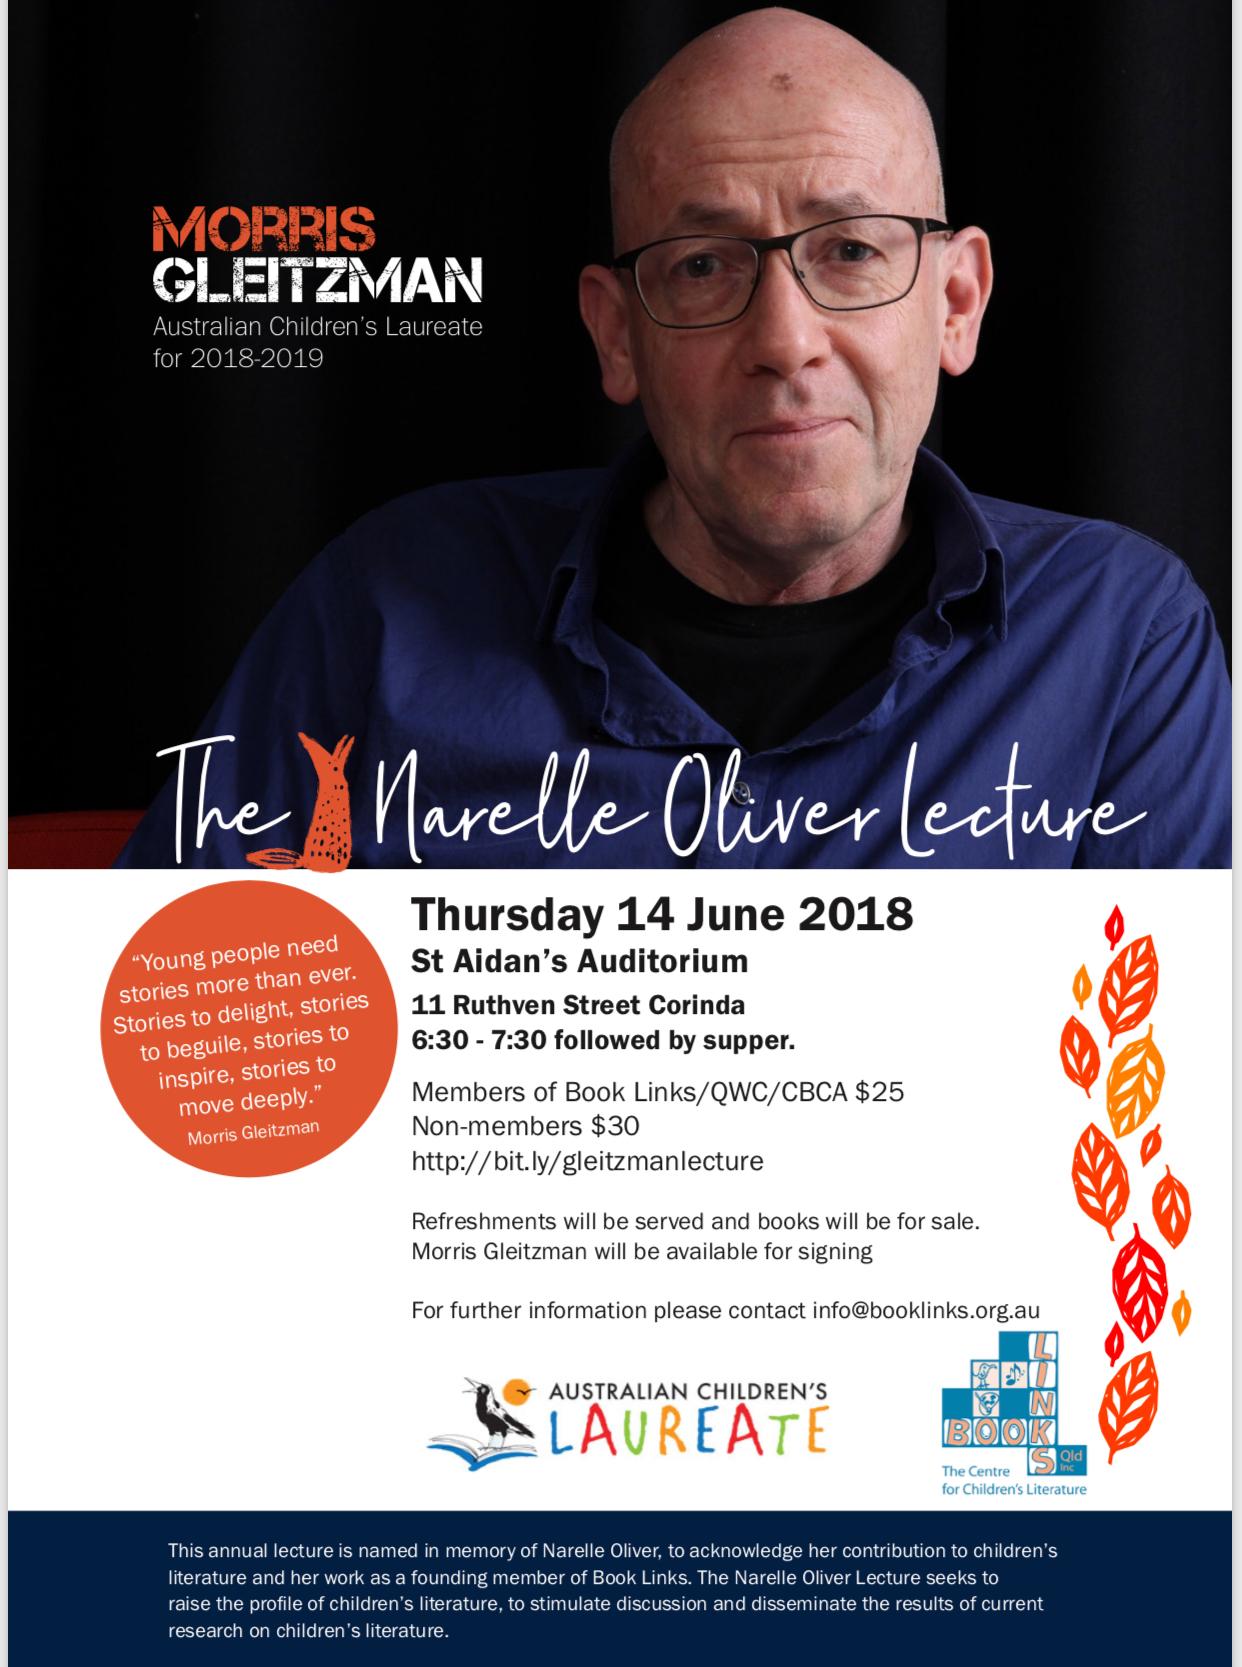 Narelle Oliver Lecture Flyer